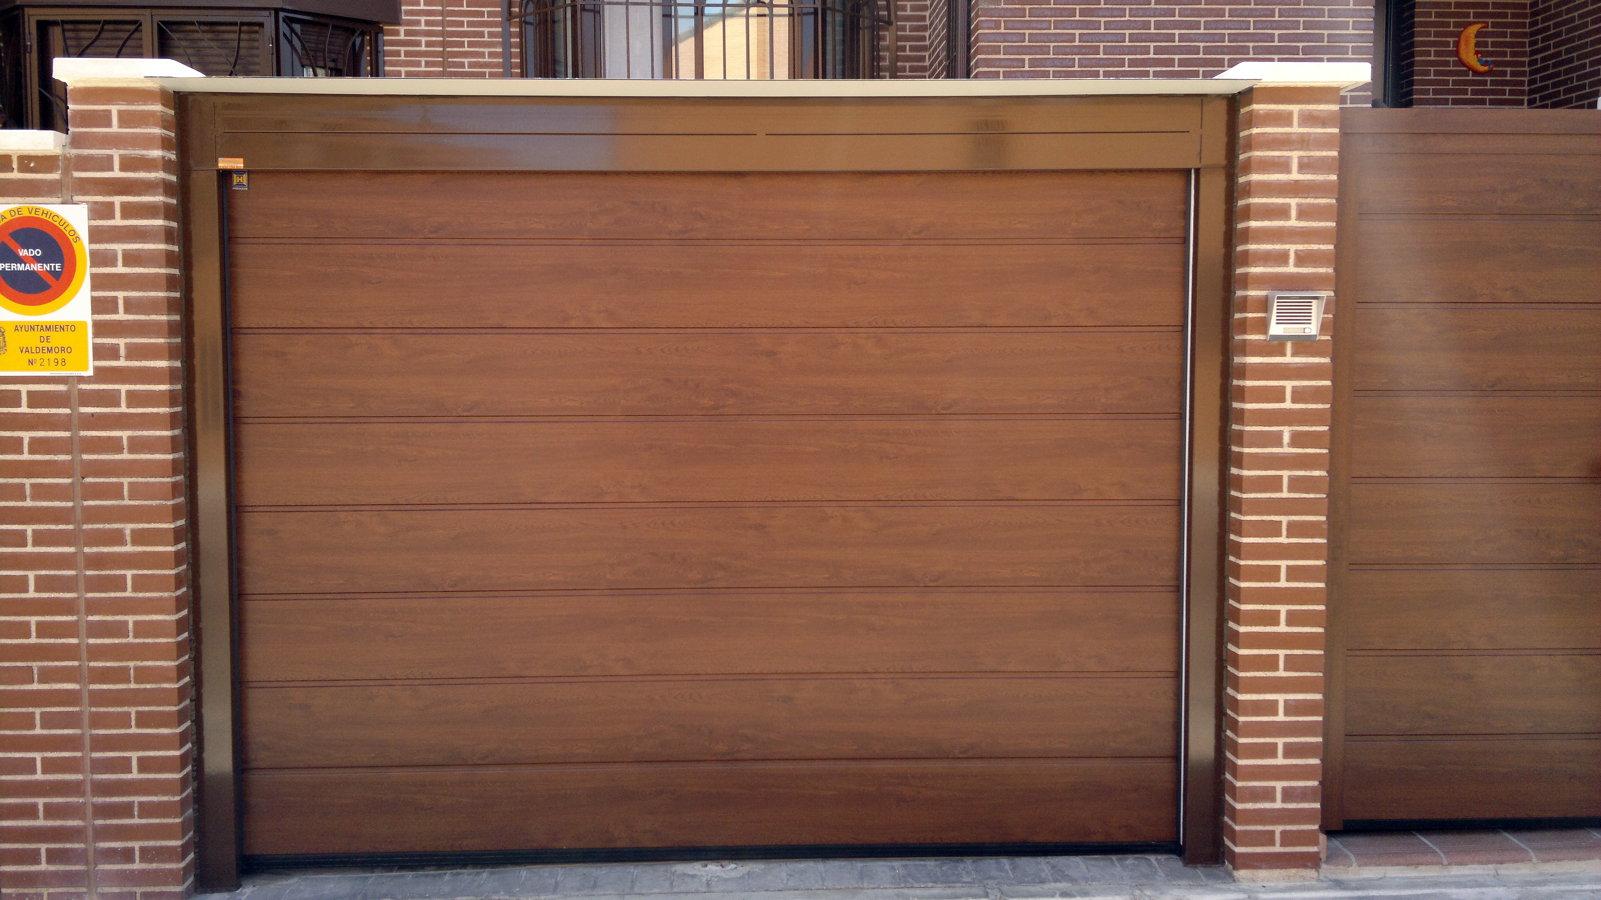 Foto puerta seccional color madera de montajes sanz for Puertas color madera